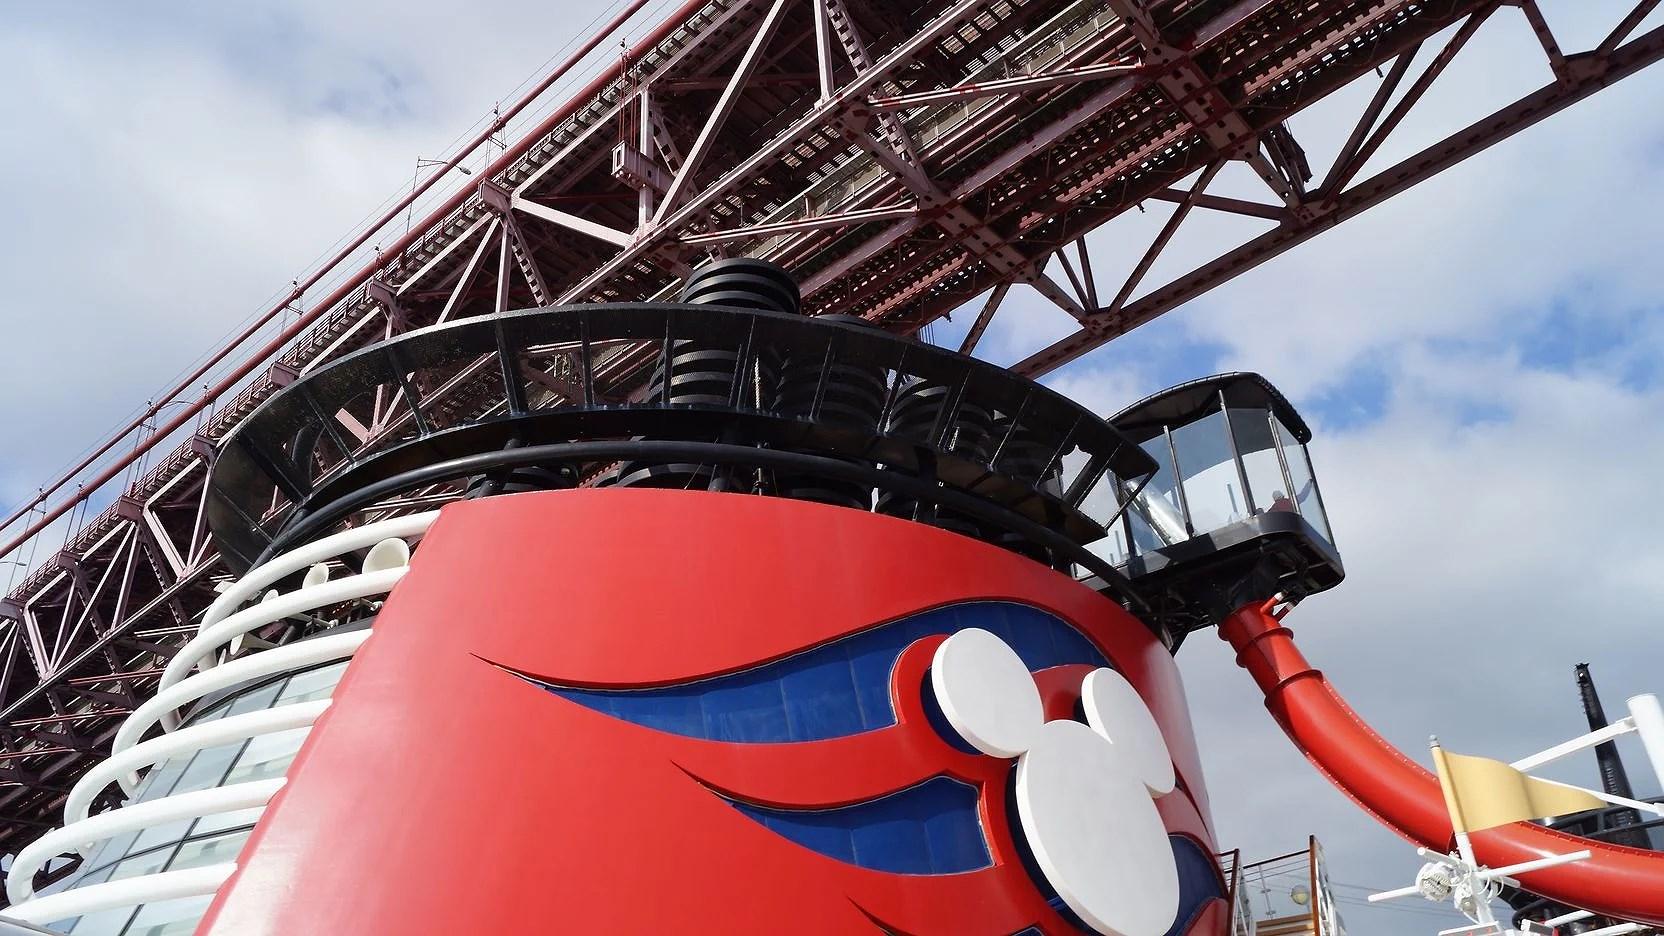 Disney land krok upp ansluta sol glasögon